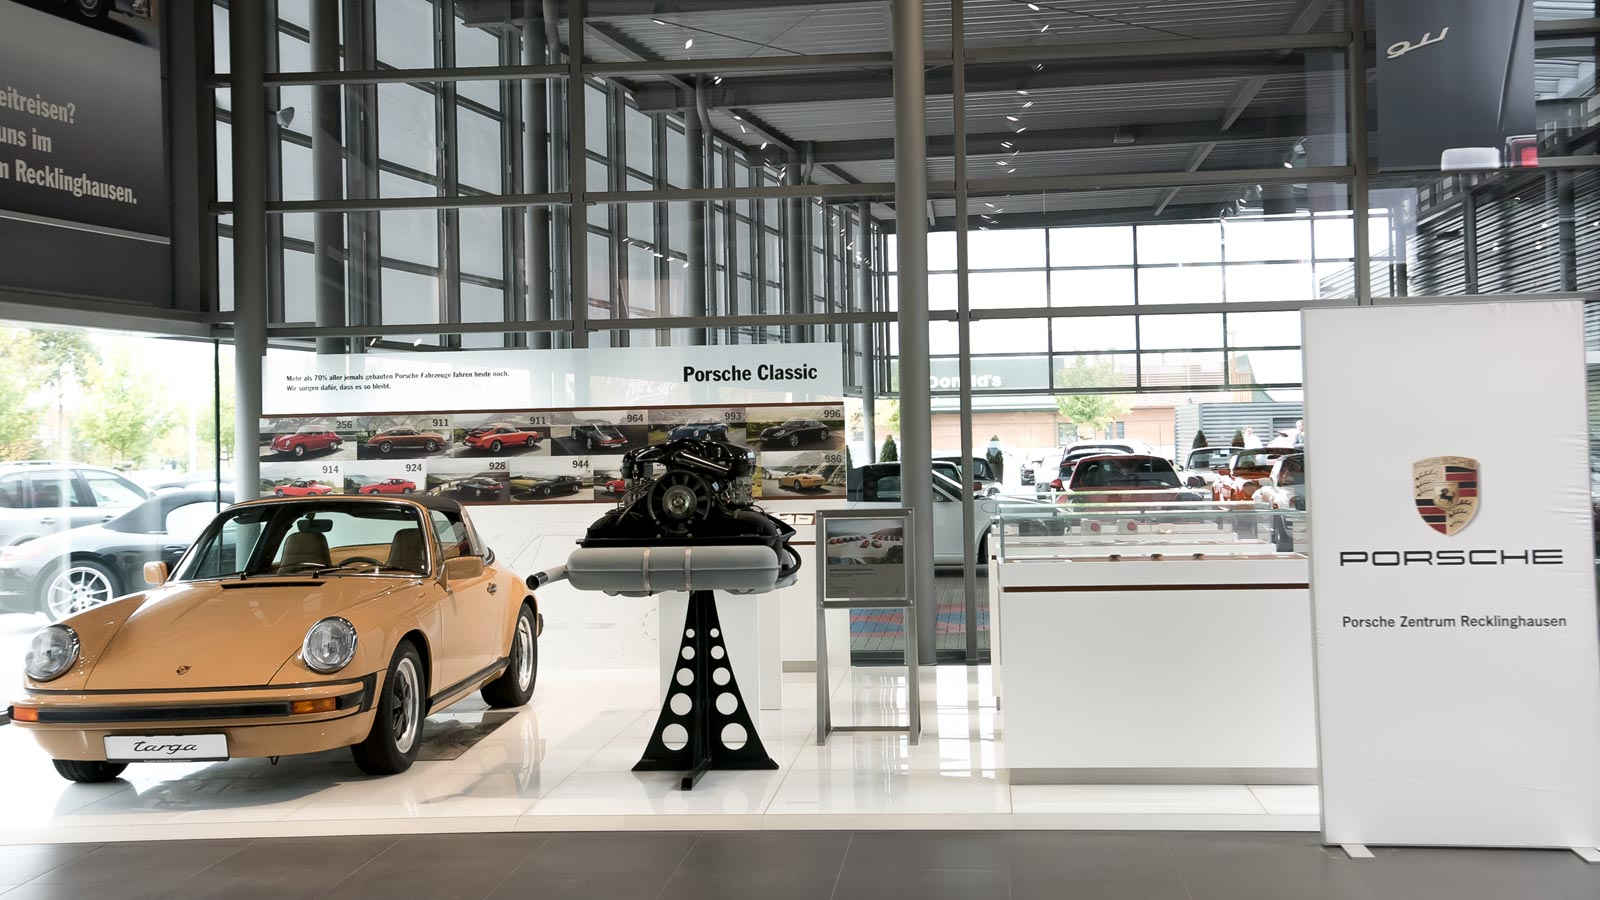 Porsche Zentrum Recklinghausen